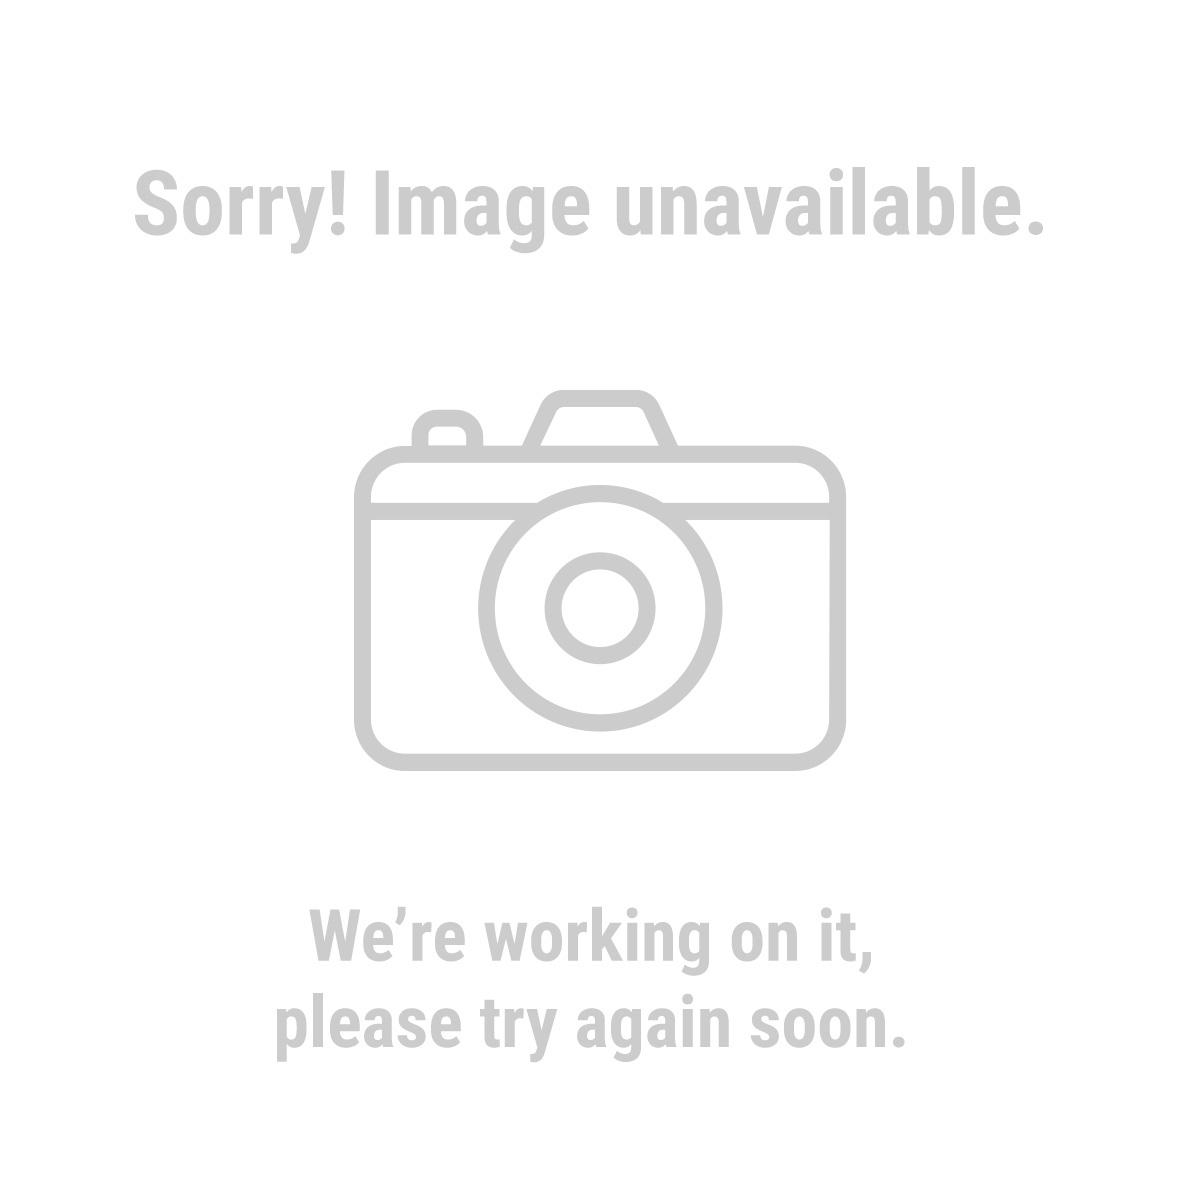 Haul-Master 69595 1500 lb. Capacity Tri-Fold Aluminum Loading Ramp